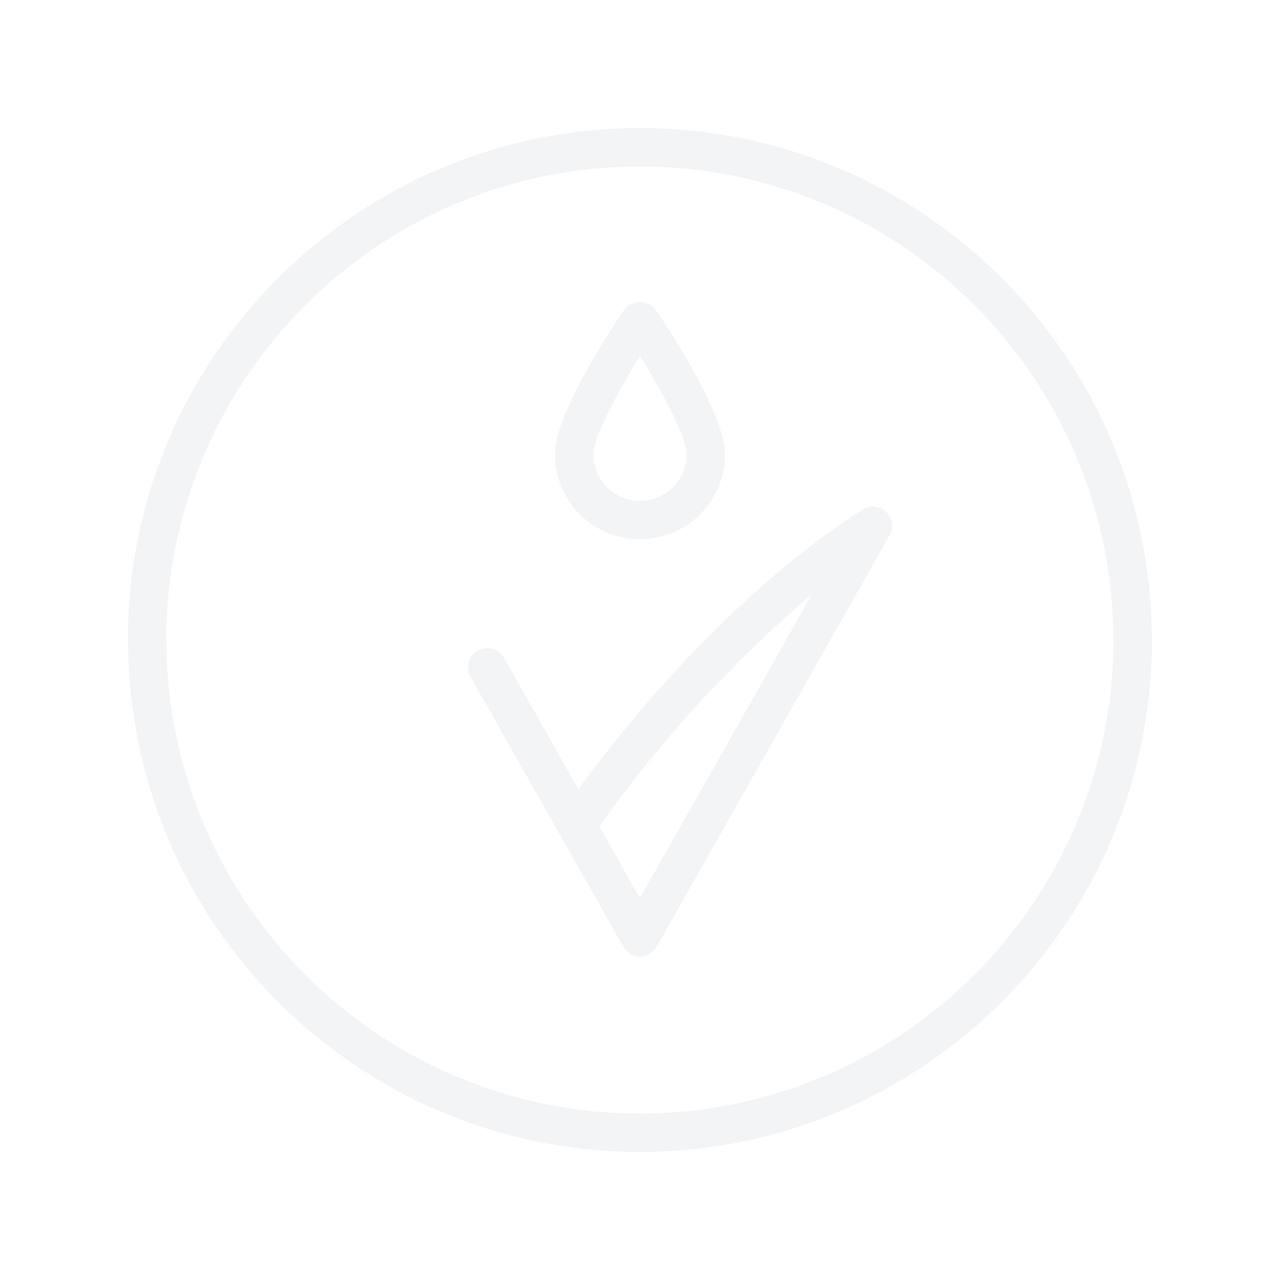 L'OREAL Bonjour Nudista Skin Tint BB Cream 30ml